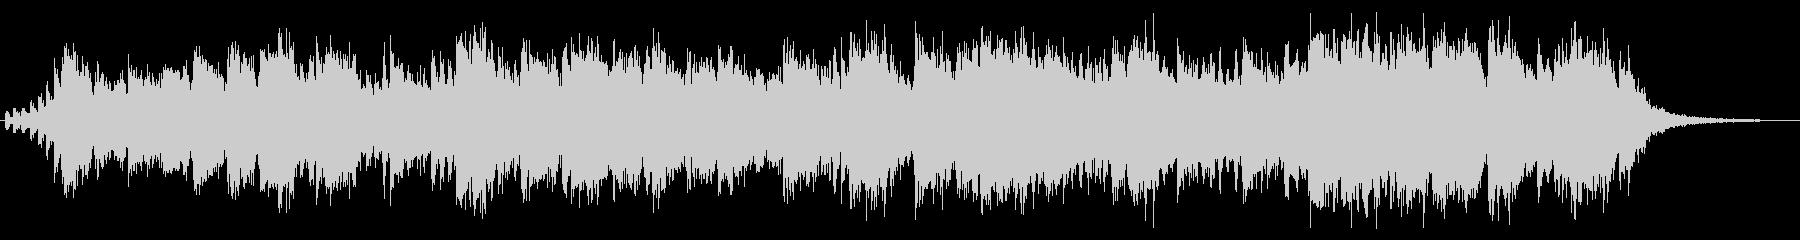 ★ Slightly serious choir ✡ Chorus + percussion instrument ✡ B's unreproduced waveform